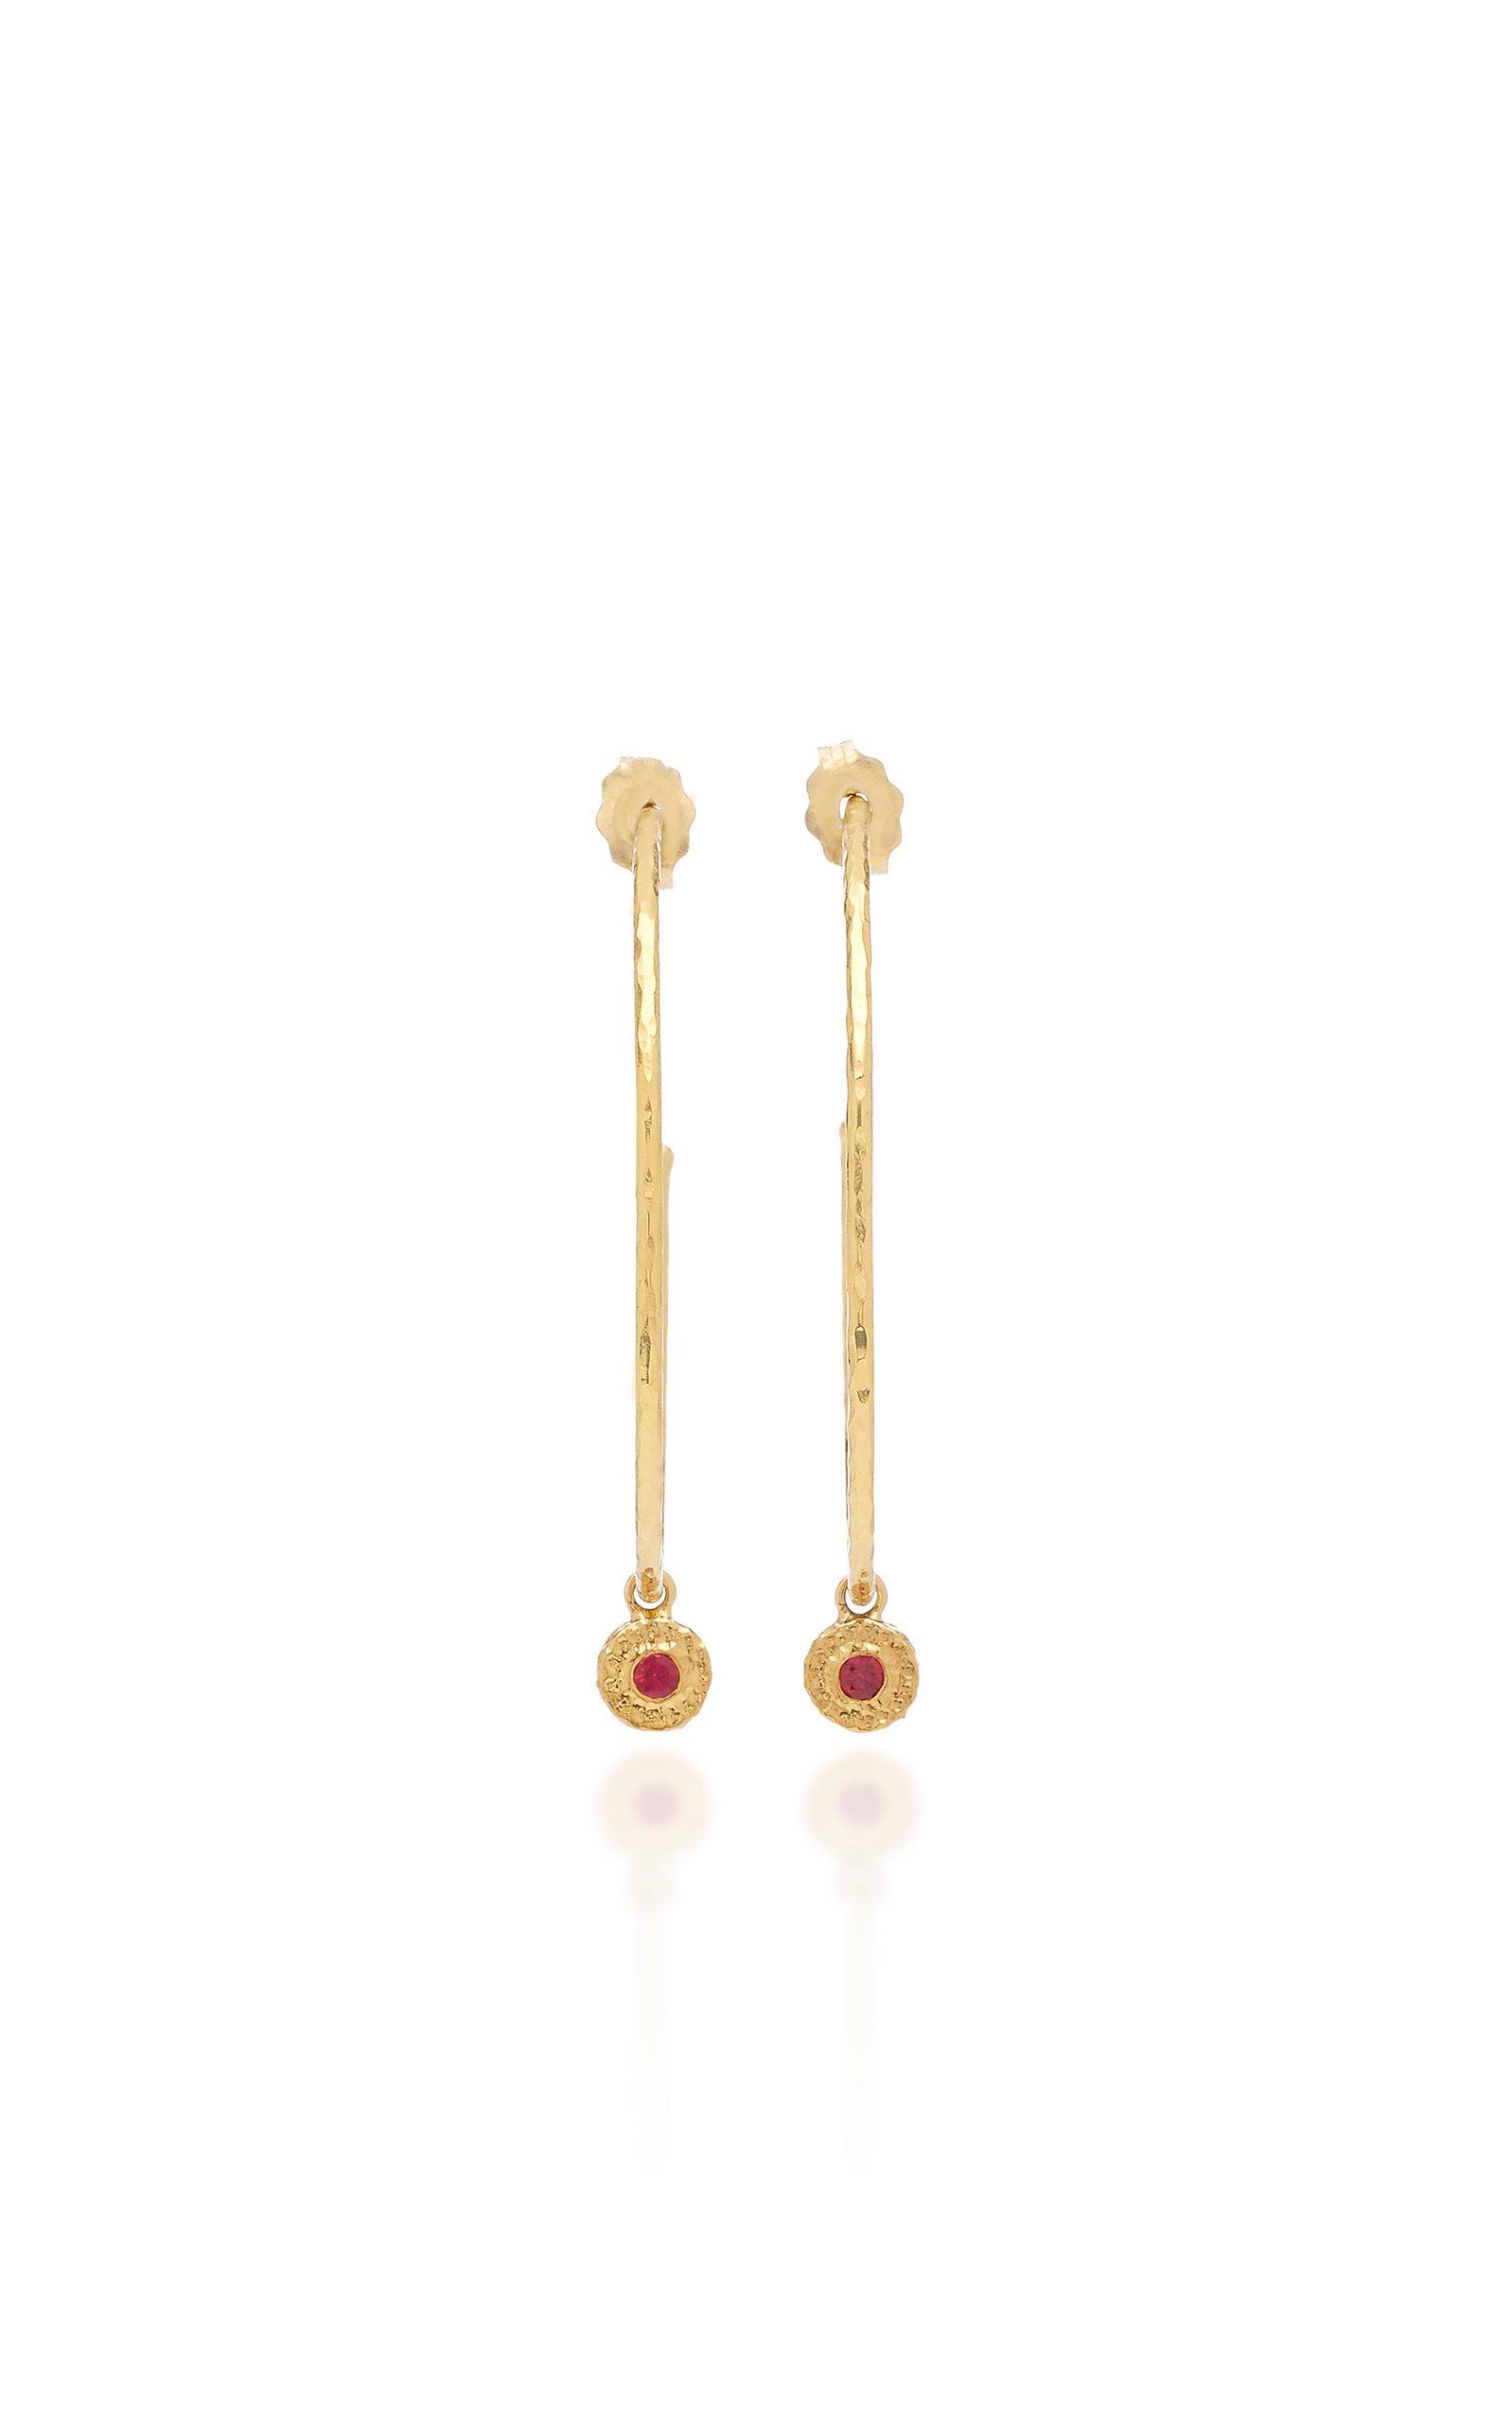 b77cbff10 Octavia ElizabethNesting Gem Ruby and 18K Gold Hoop Earrings. CLOSE.  Loading. Loading